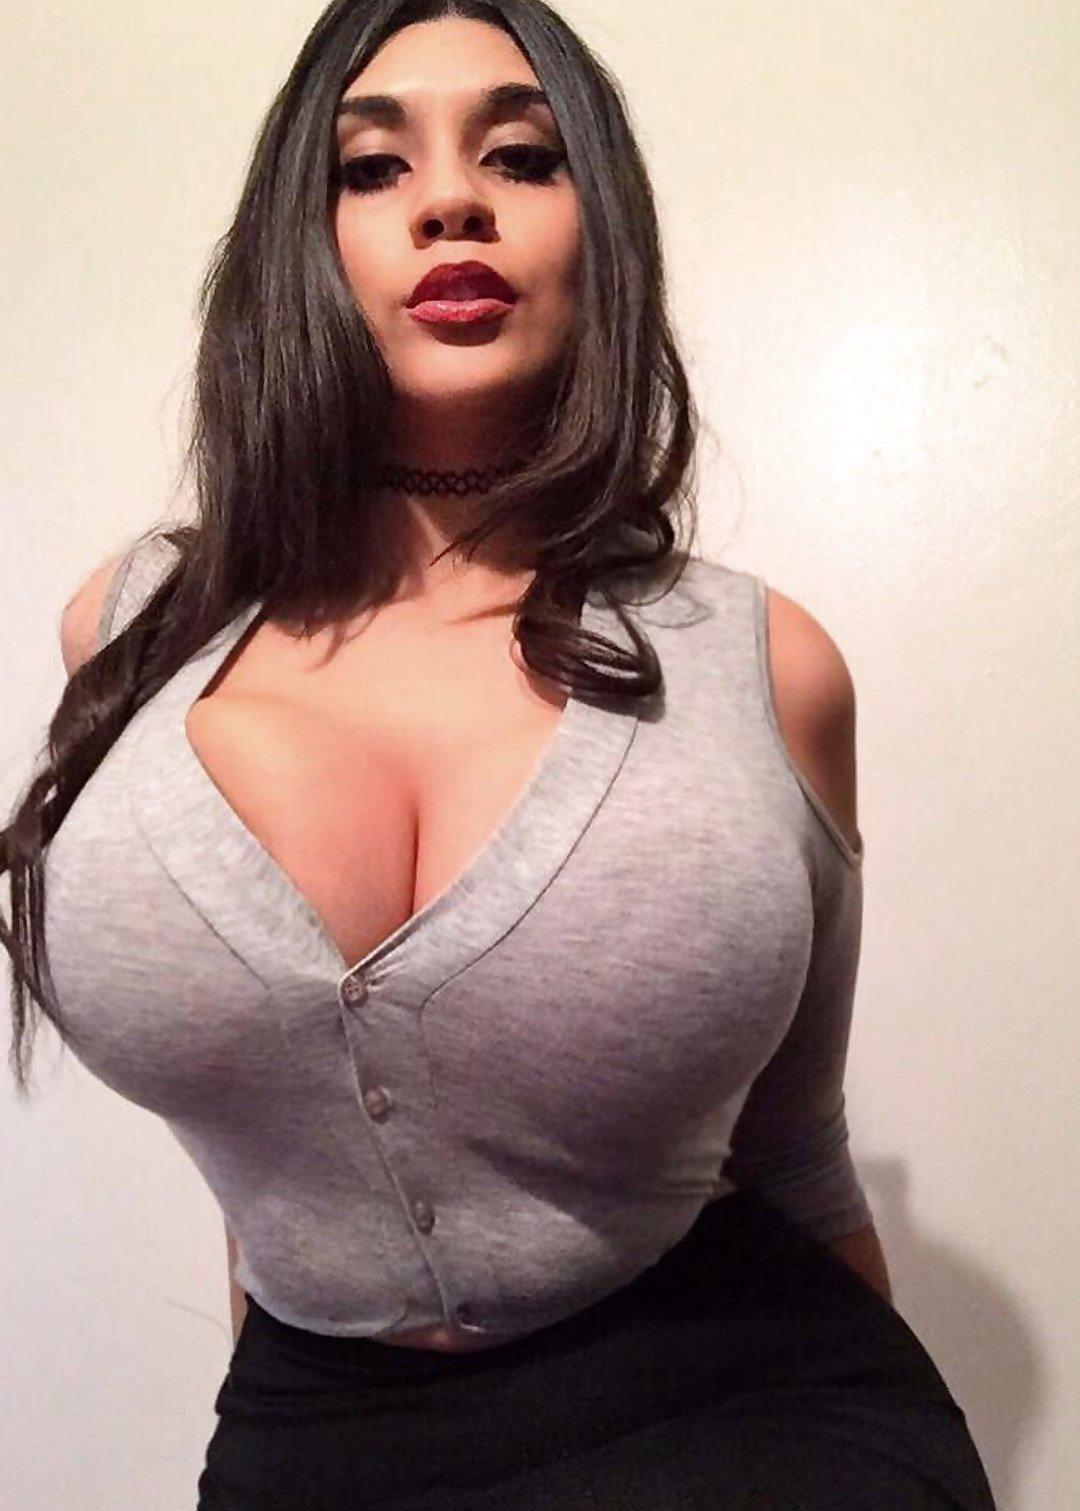 Skinny Big Boobs Tight Sweater